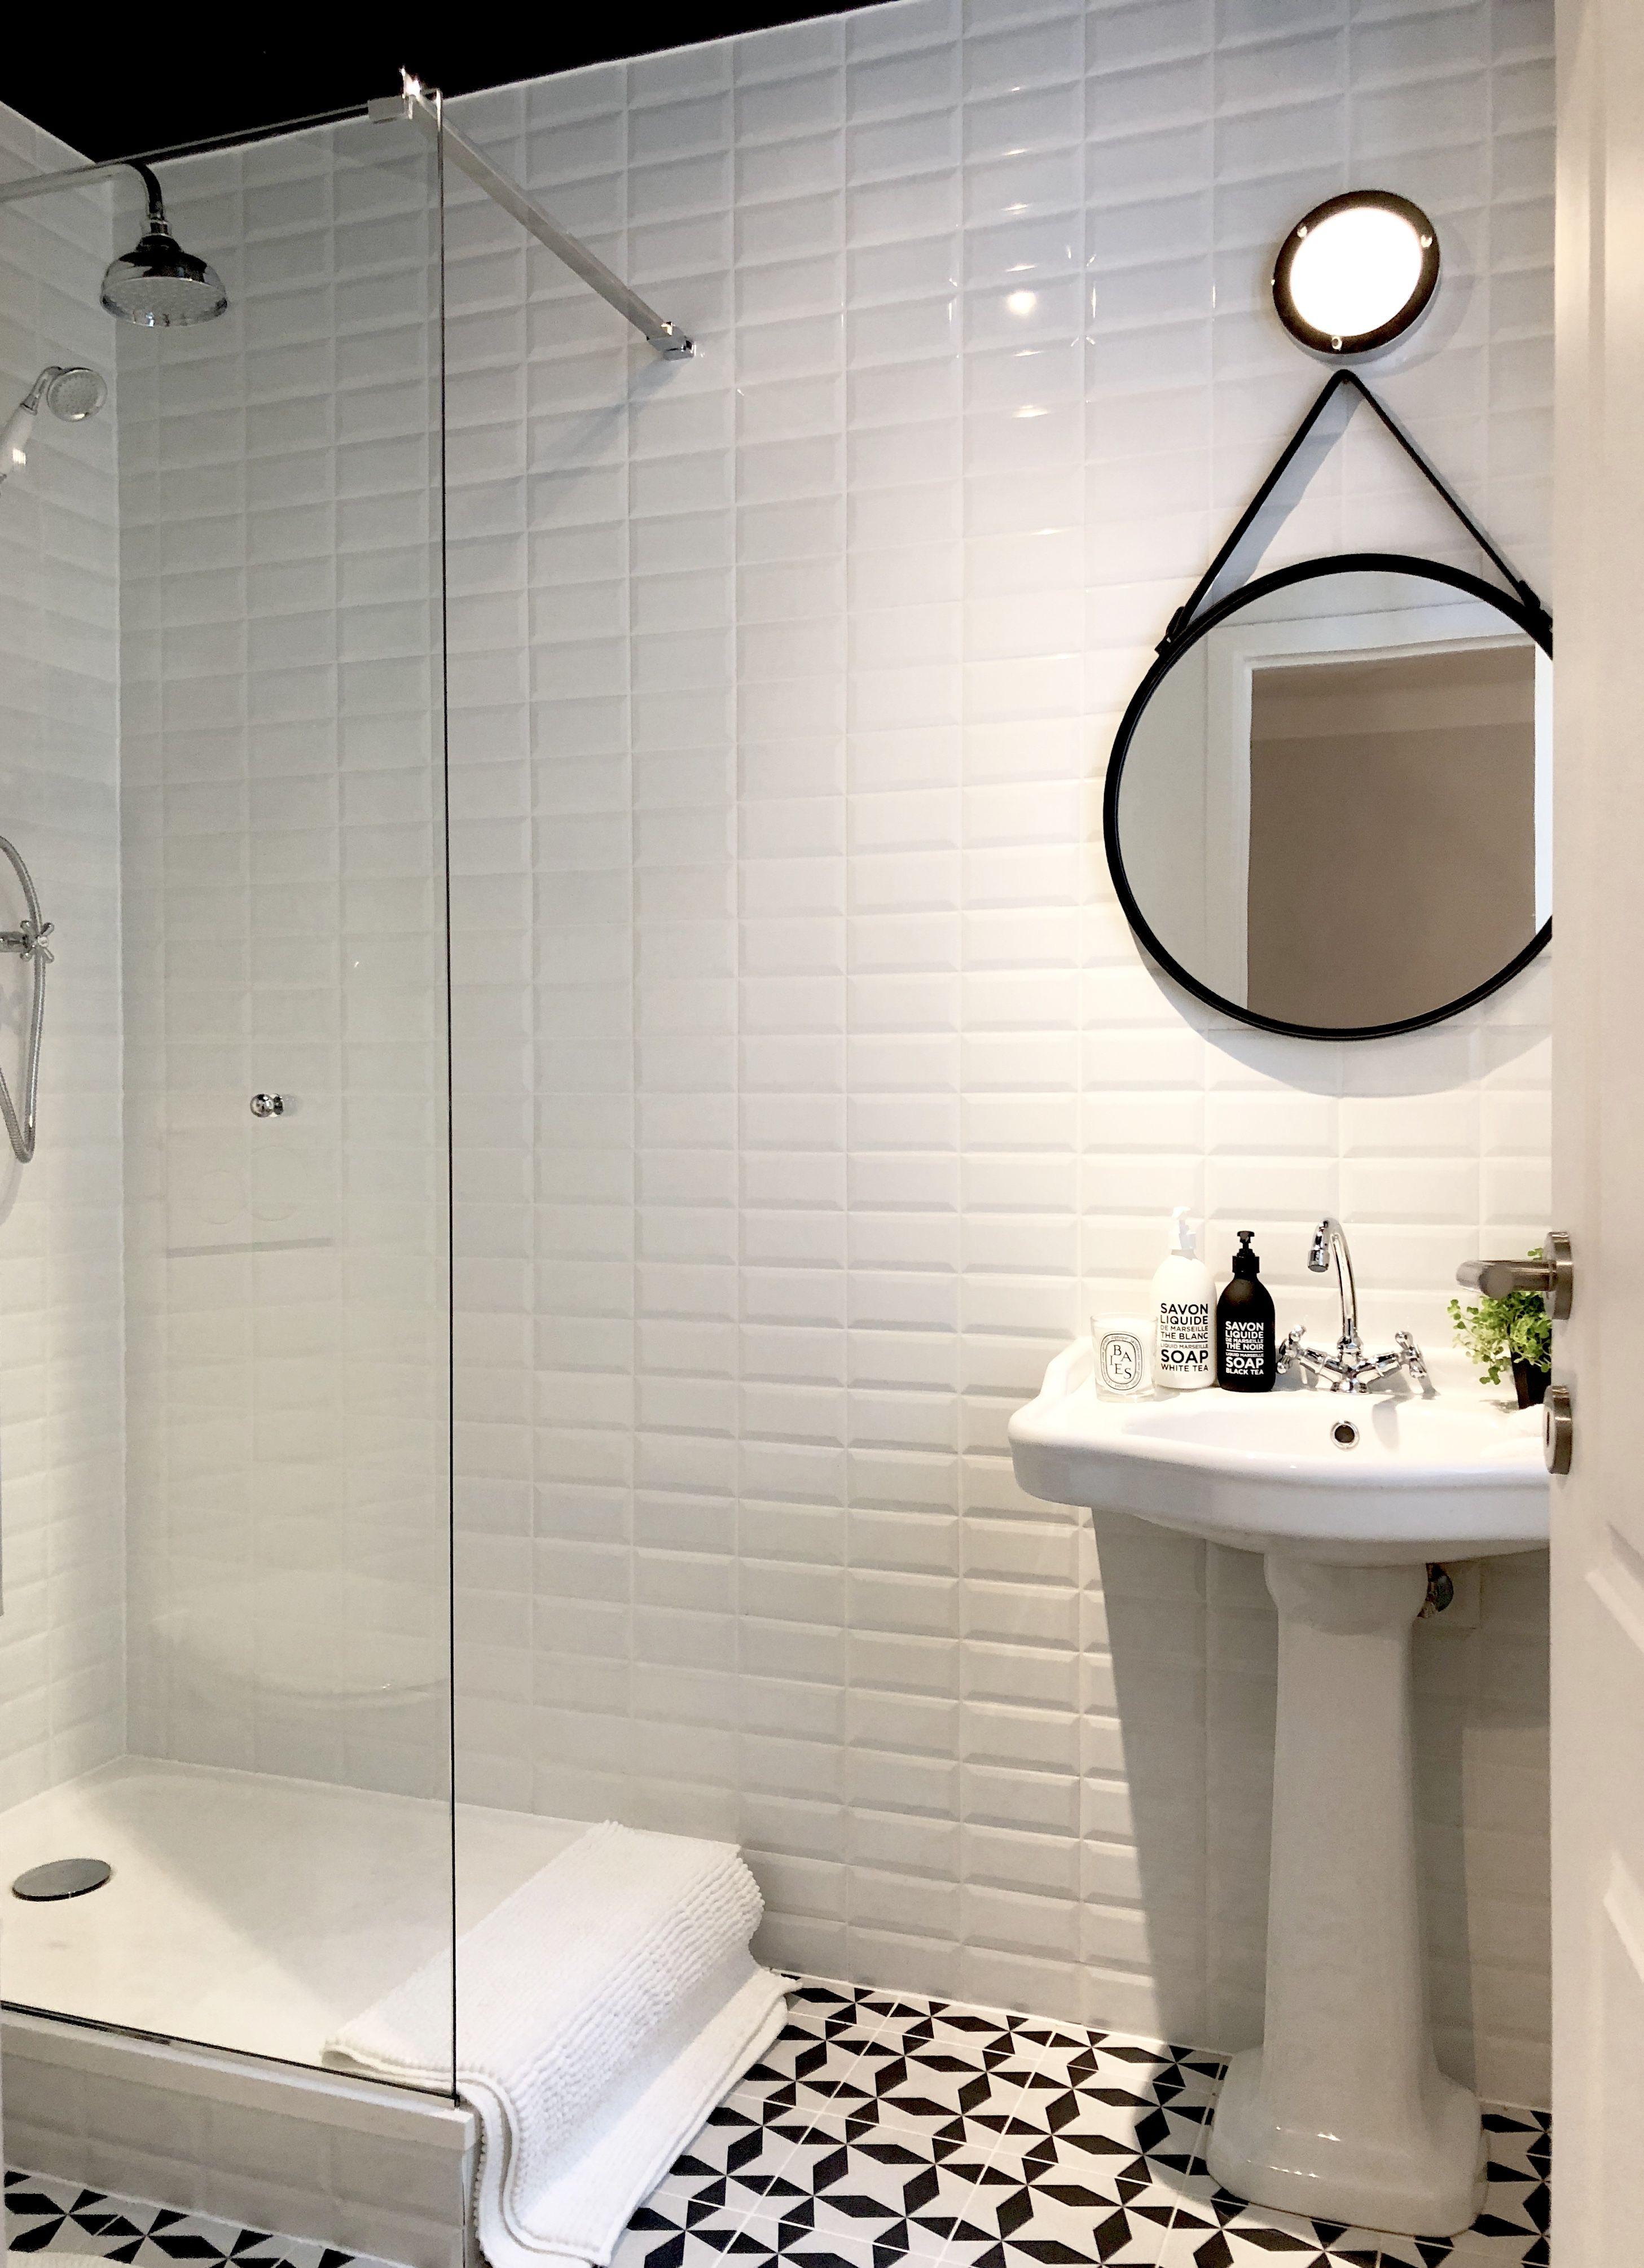 28+ Photo salle de bain carrelage inspirations